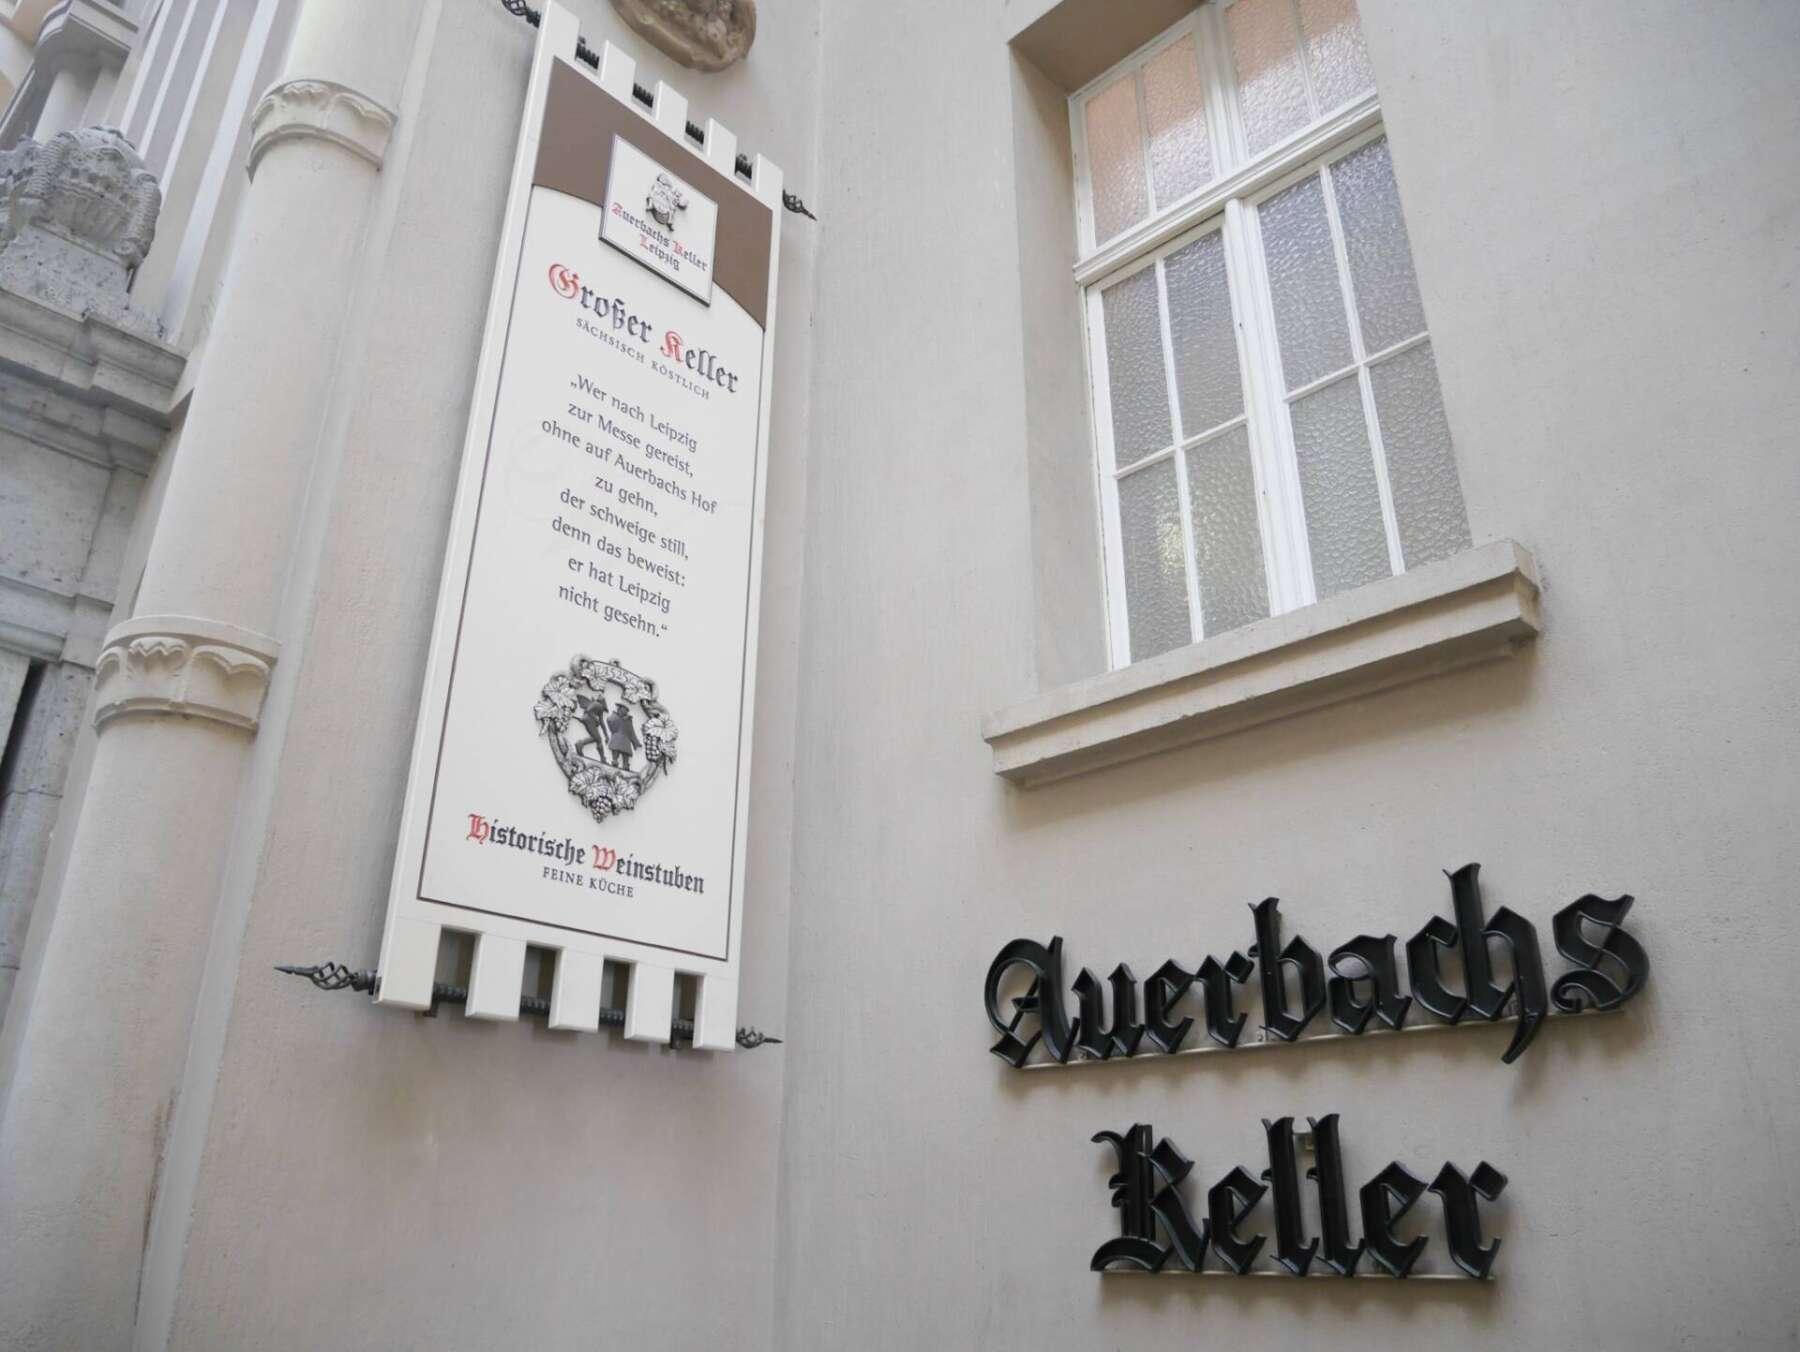 Auerbach's Keller